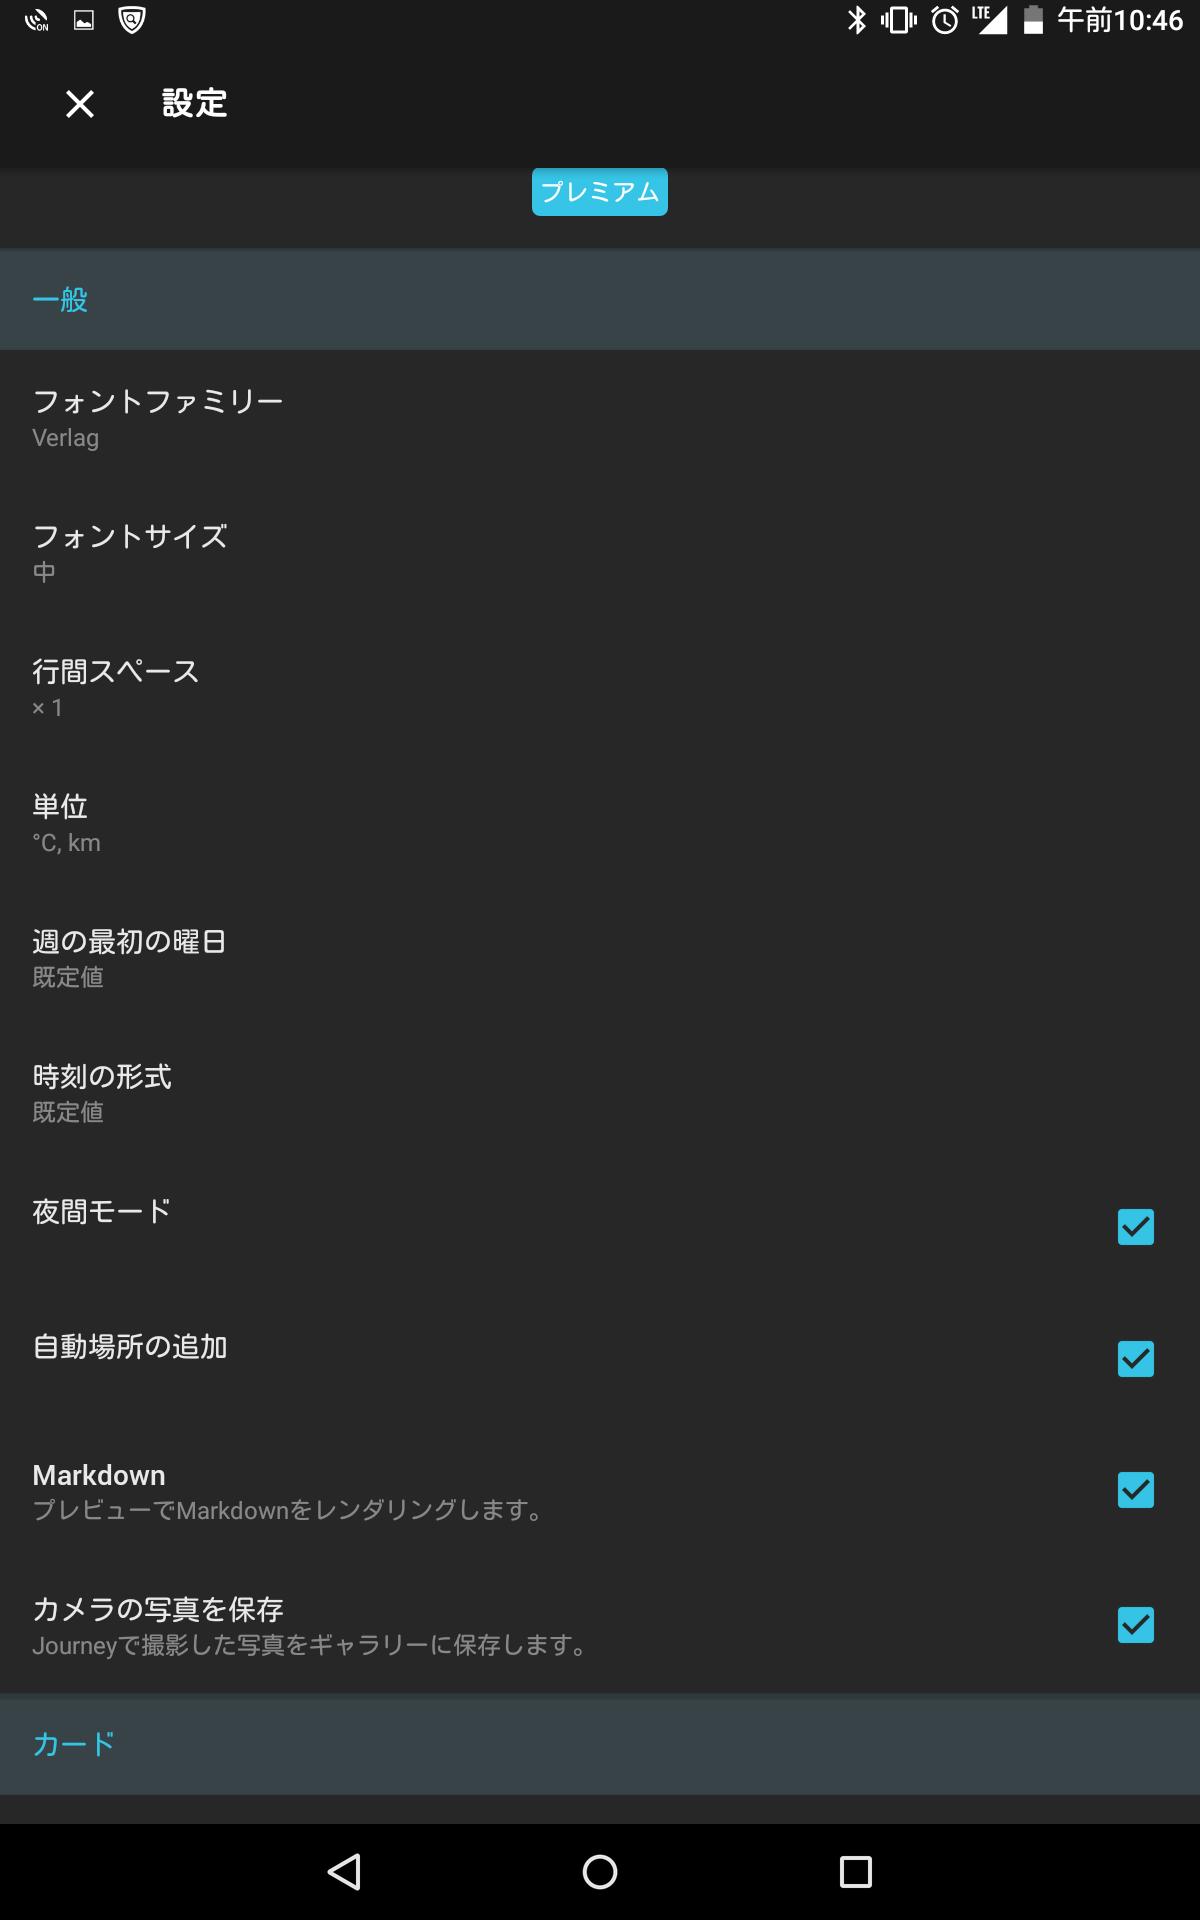 Screenshot_2018-04-17-10-46-31.png